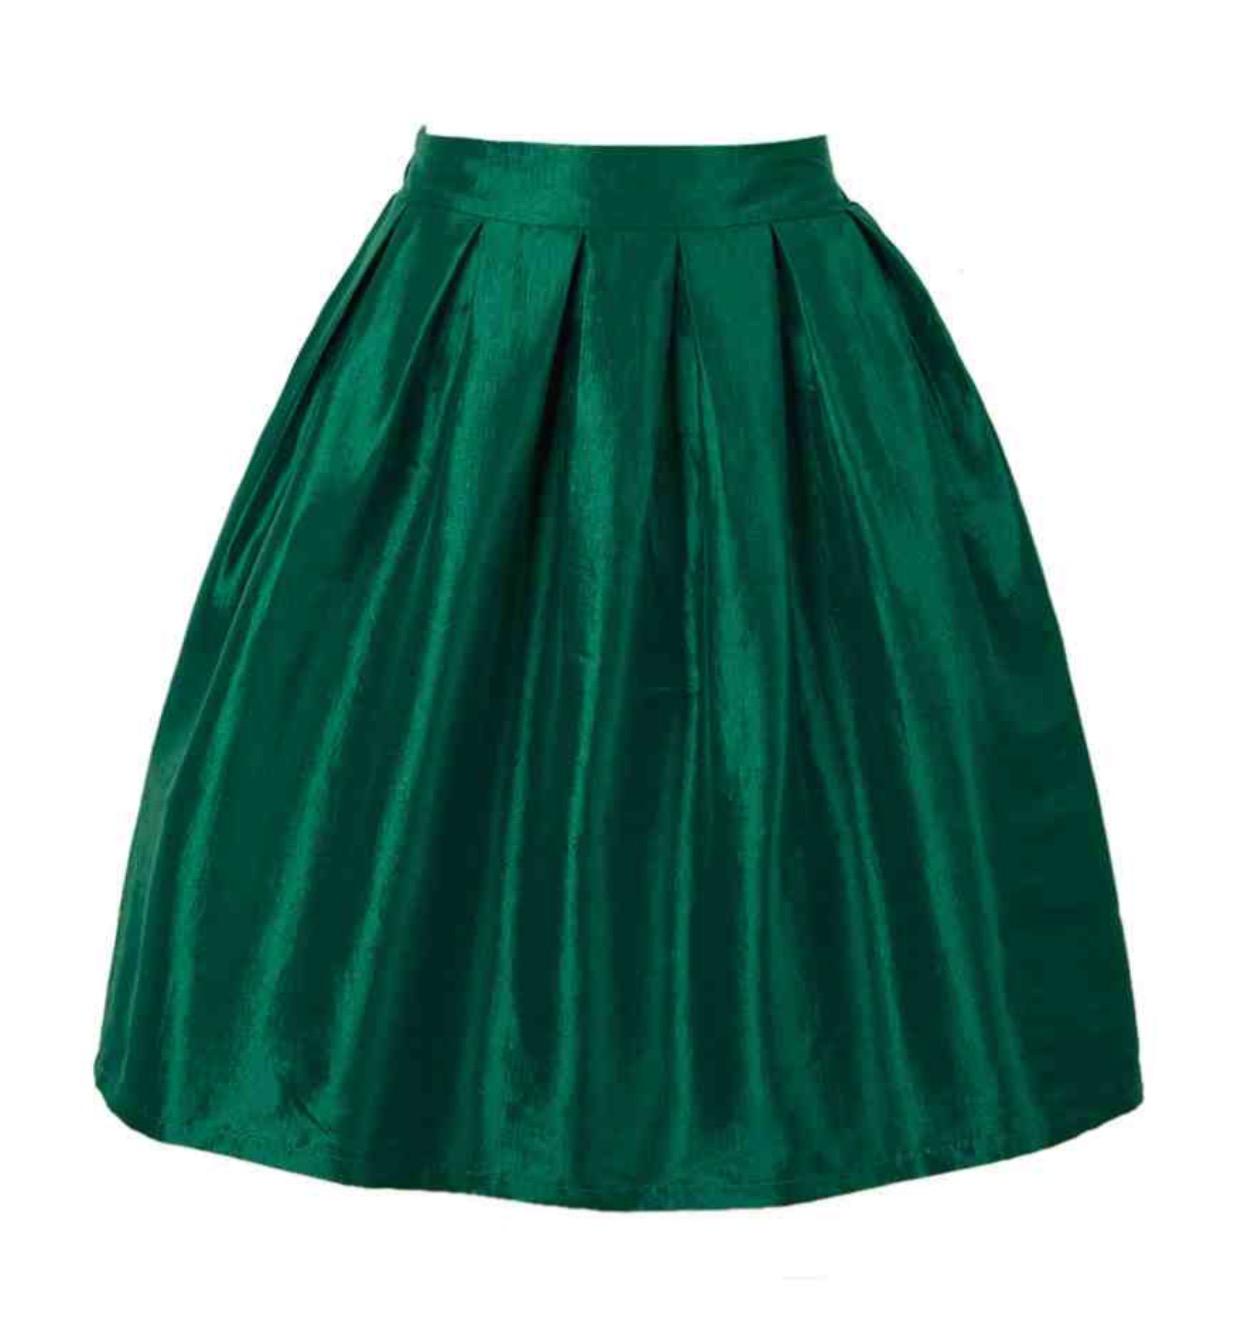 emerald satin midi skirt 183 trendy wendy z boutique